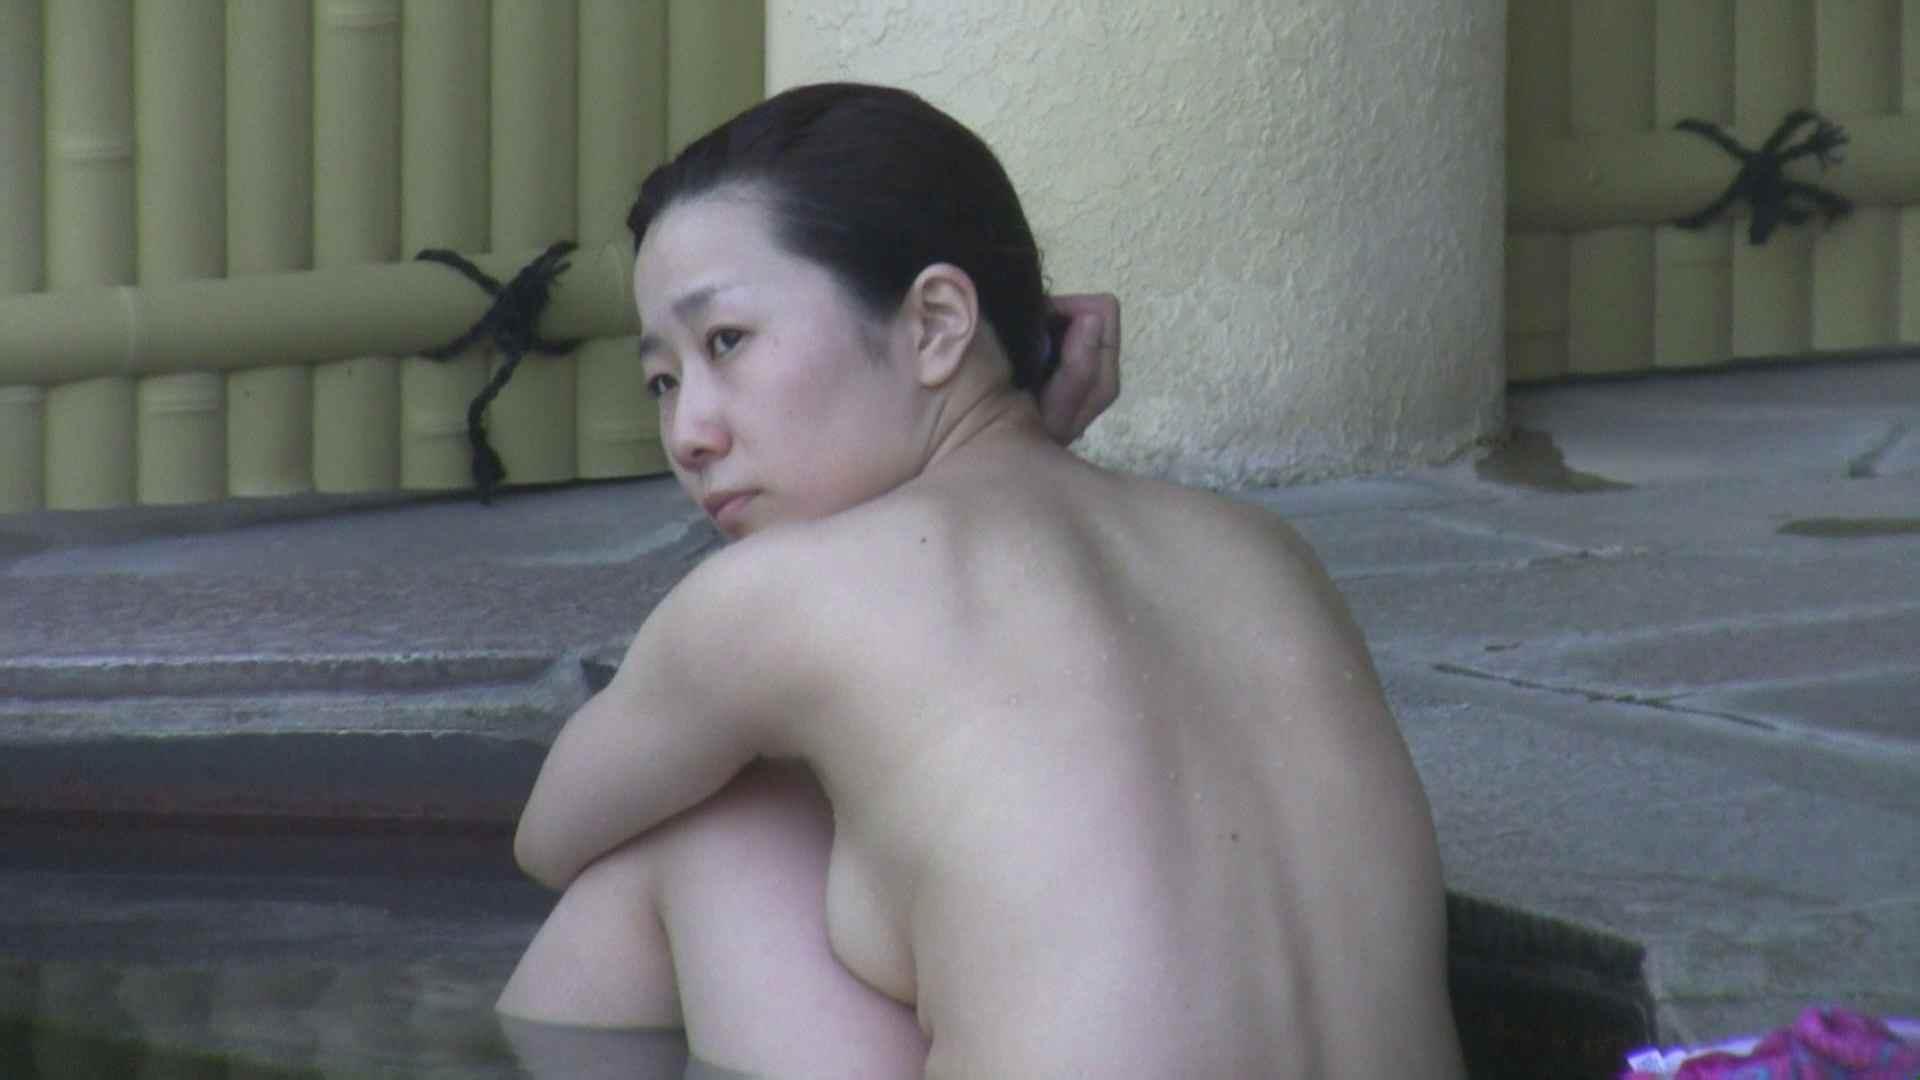 Aquaな露天風呂Vol.88【VIP限定】 綺麗なOLたち  57枚 12